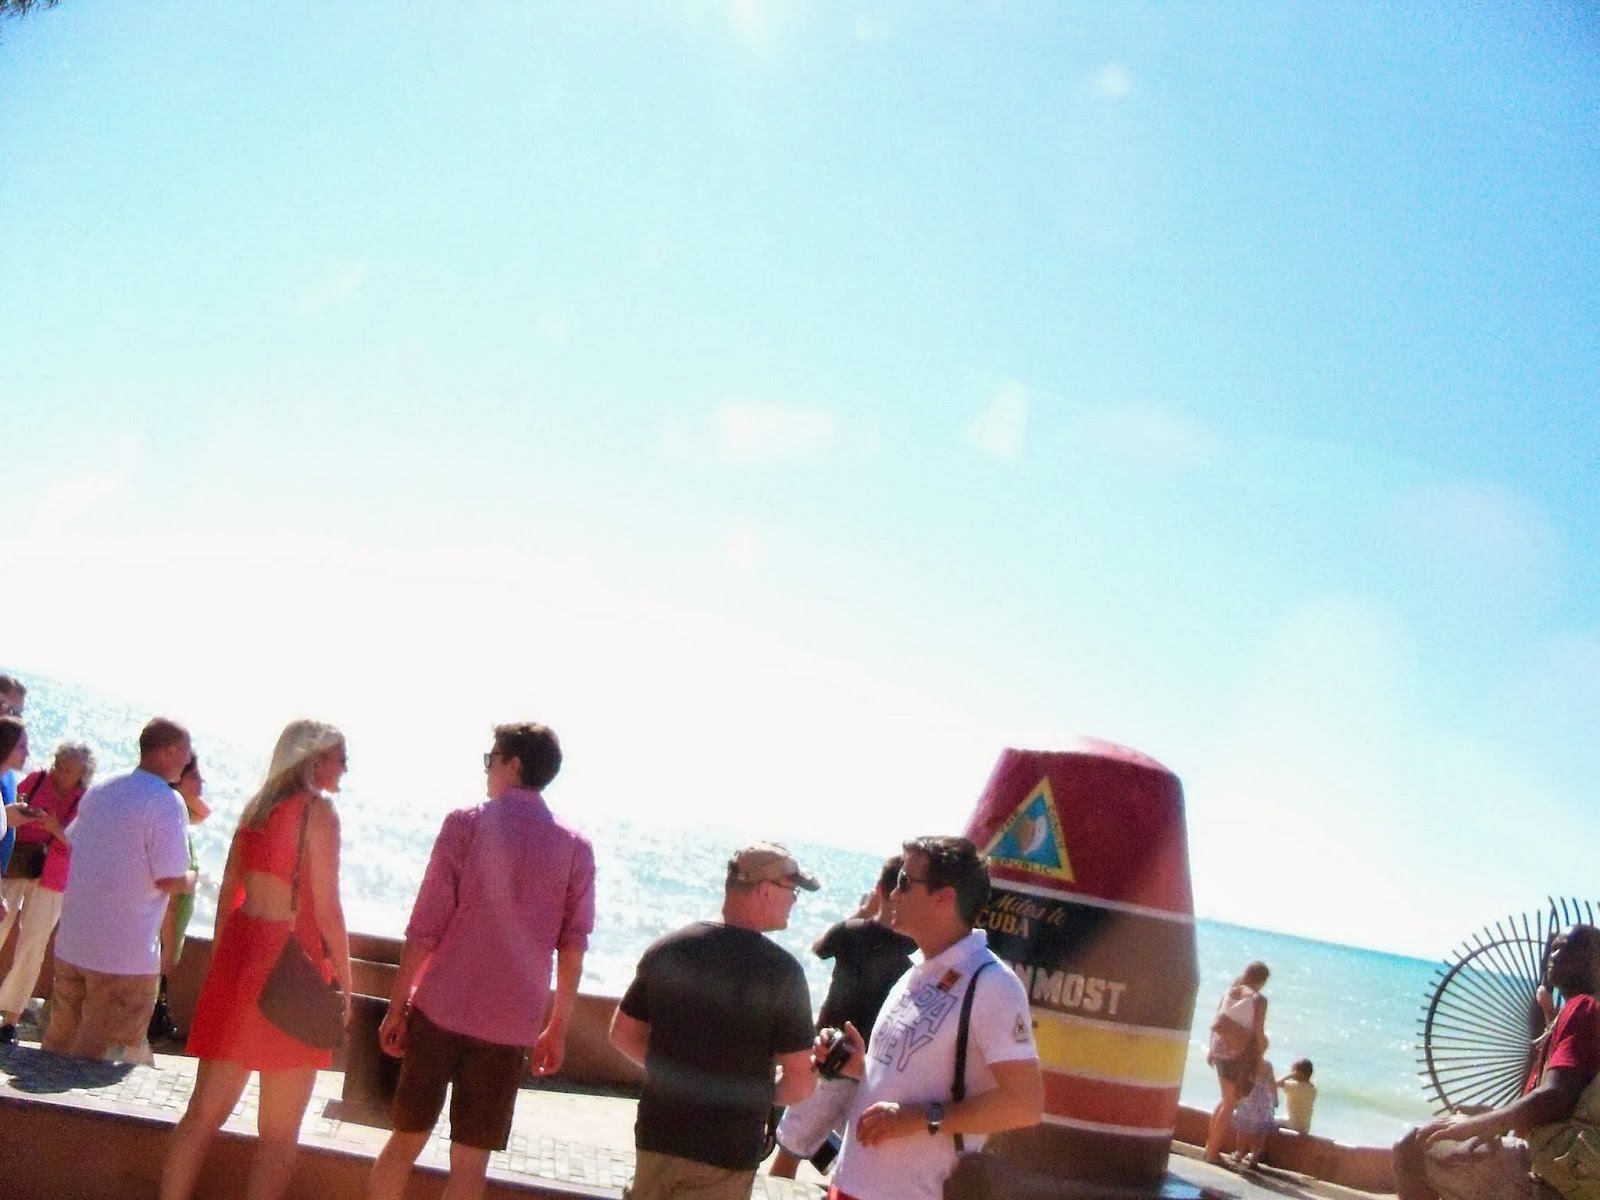 Key West Vacation - 116_5817.JPG